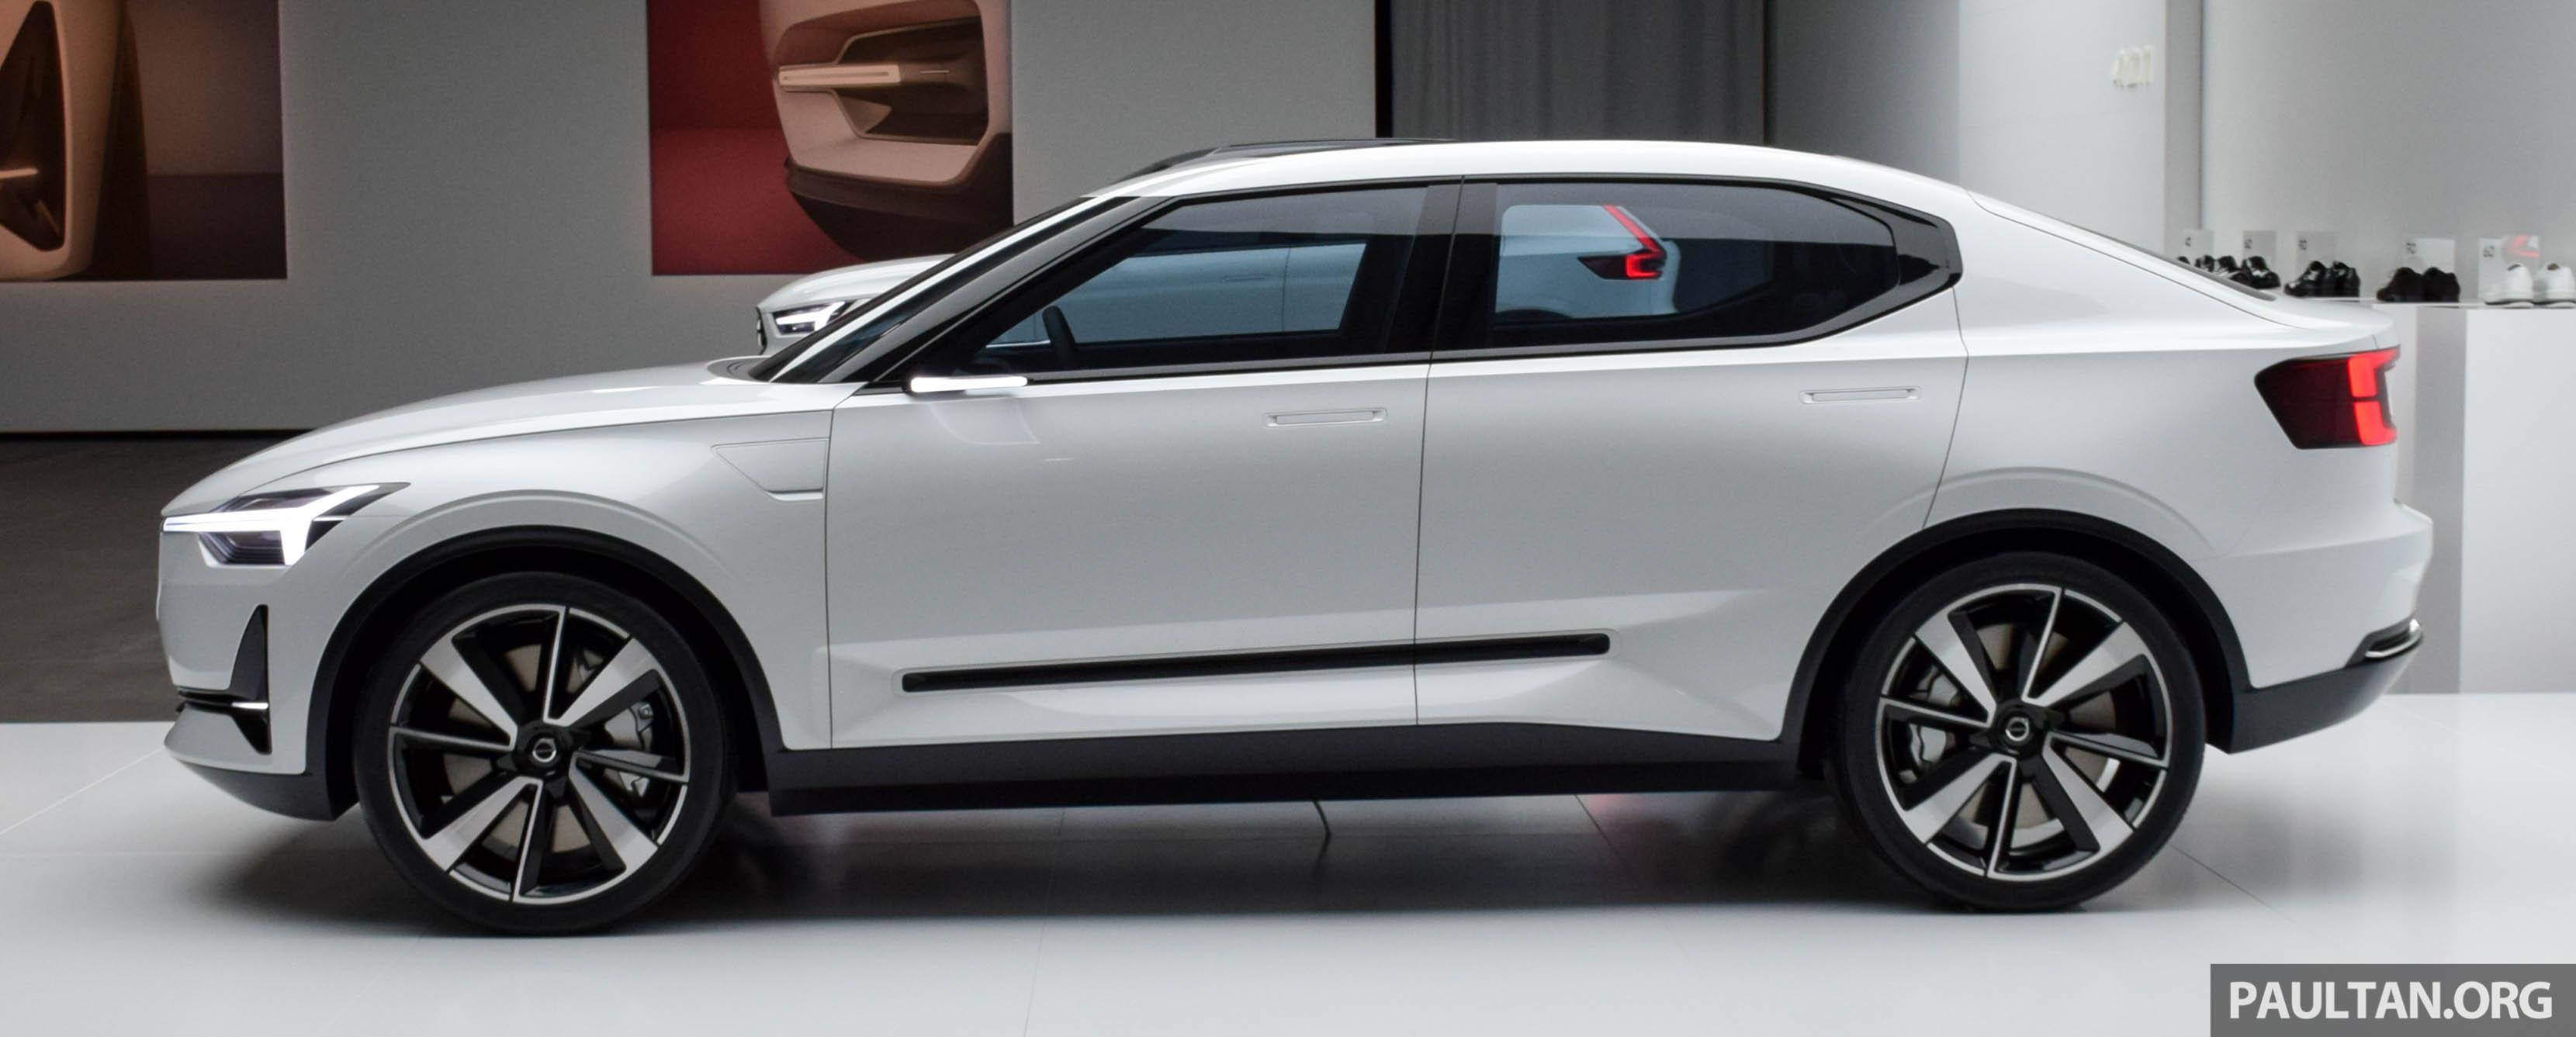 Gallery Volvo 40 2 Concept Previews Next Gen S40 Image